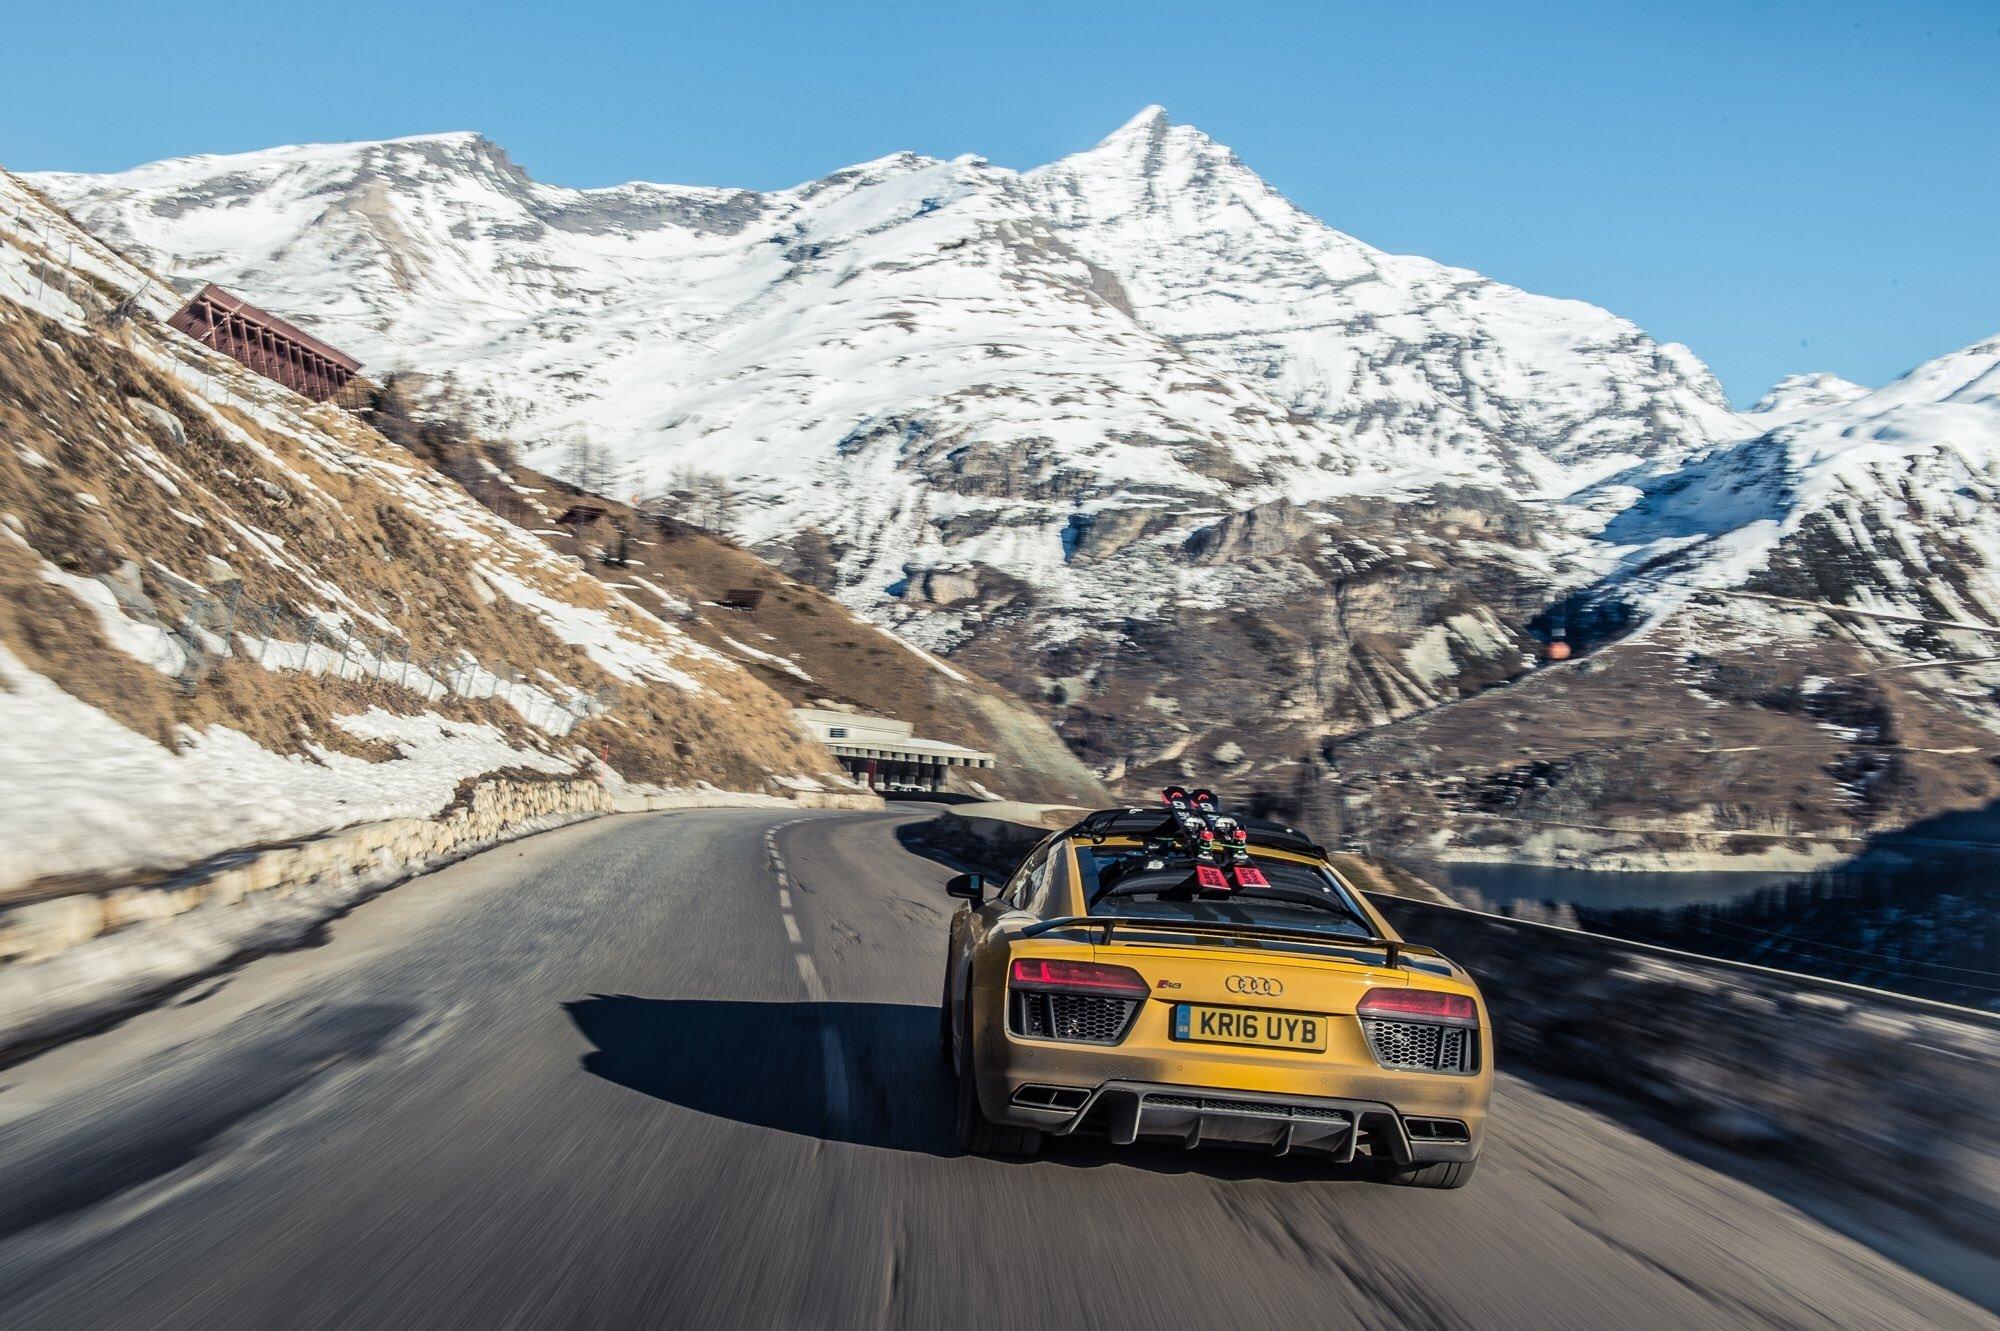 mountains, Road, Vehicle, Car, Audi Wallpaper